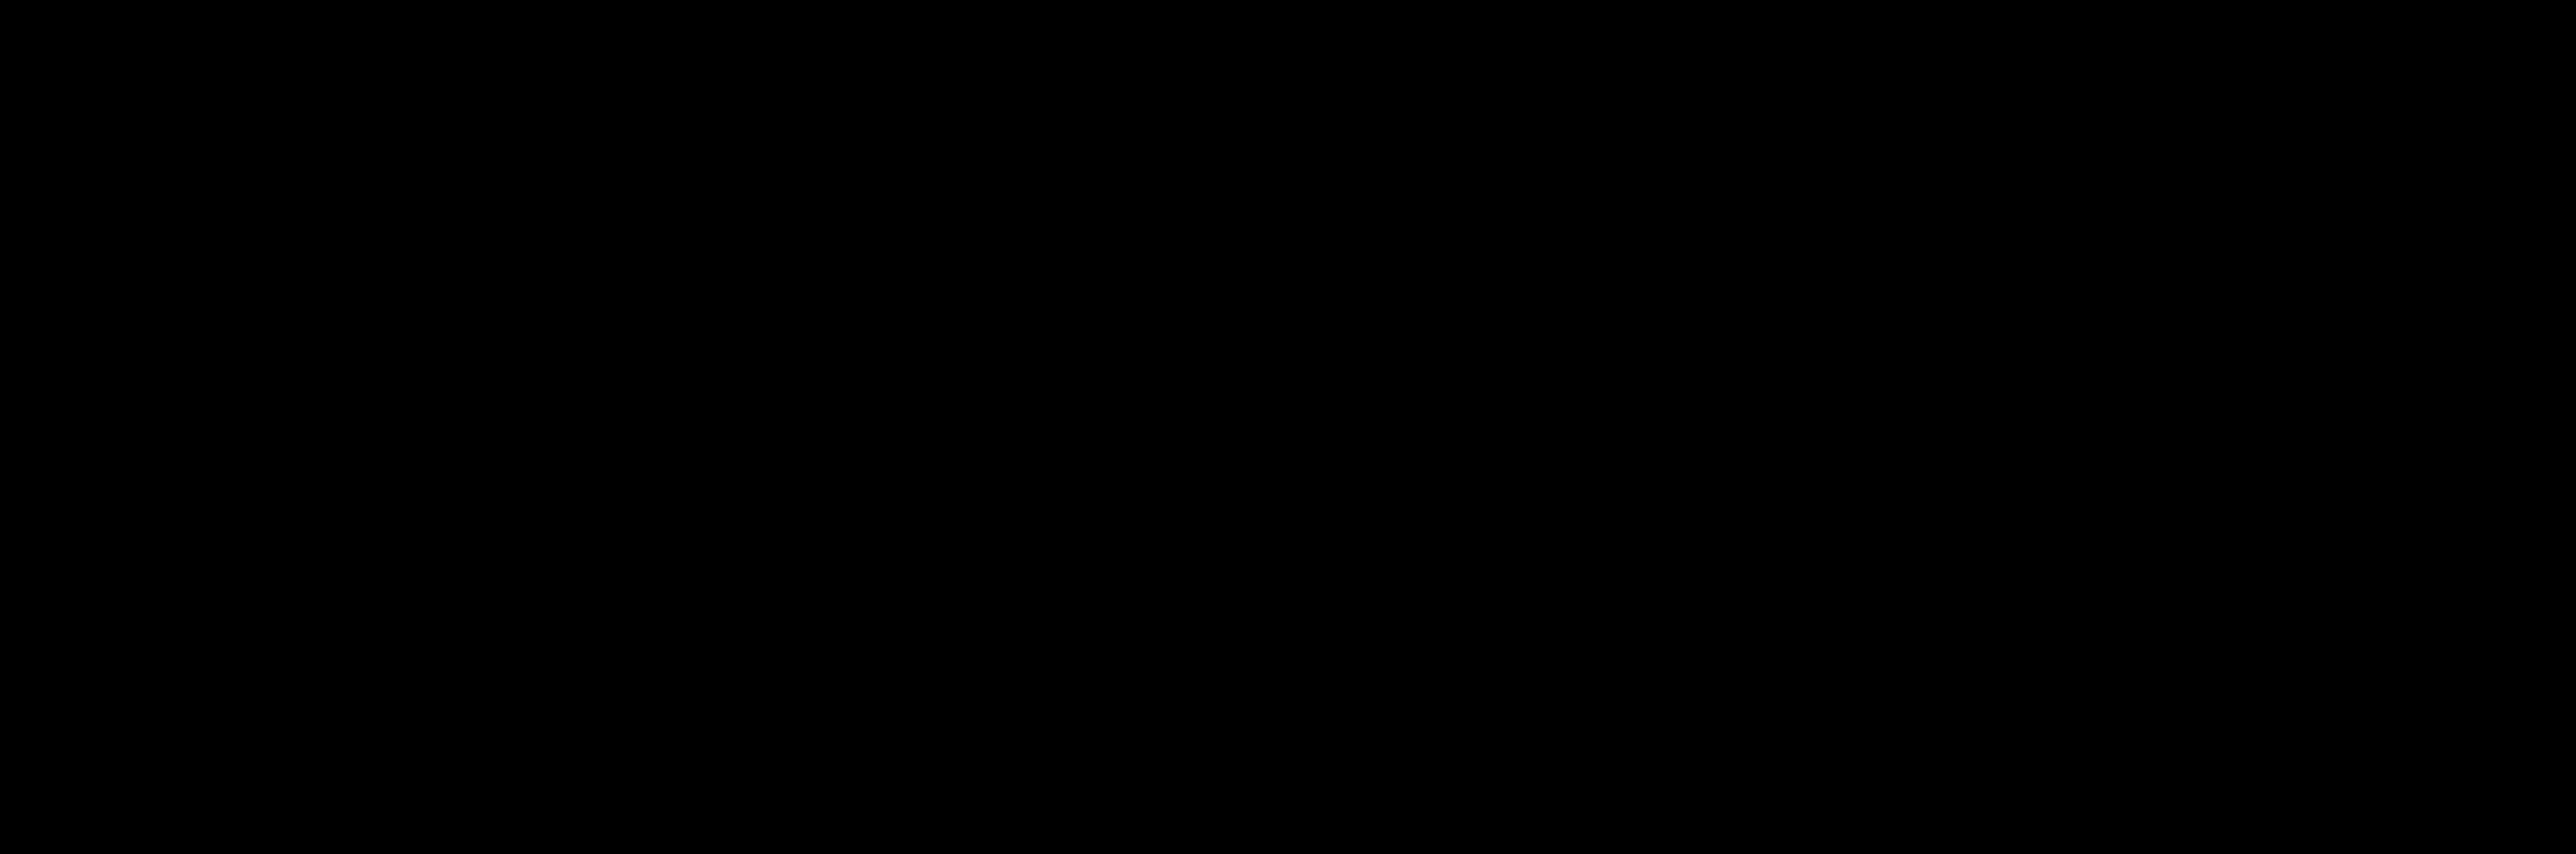 Variant – Tip Trailer – 2015 T2 (397x150x107 cm)